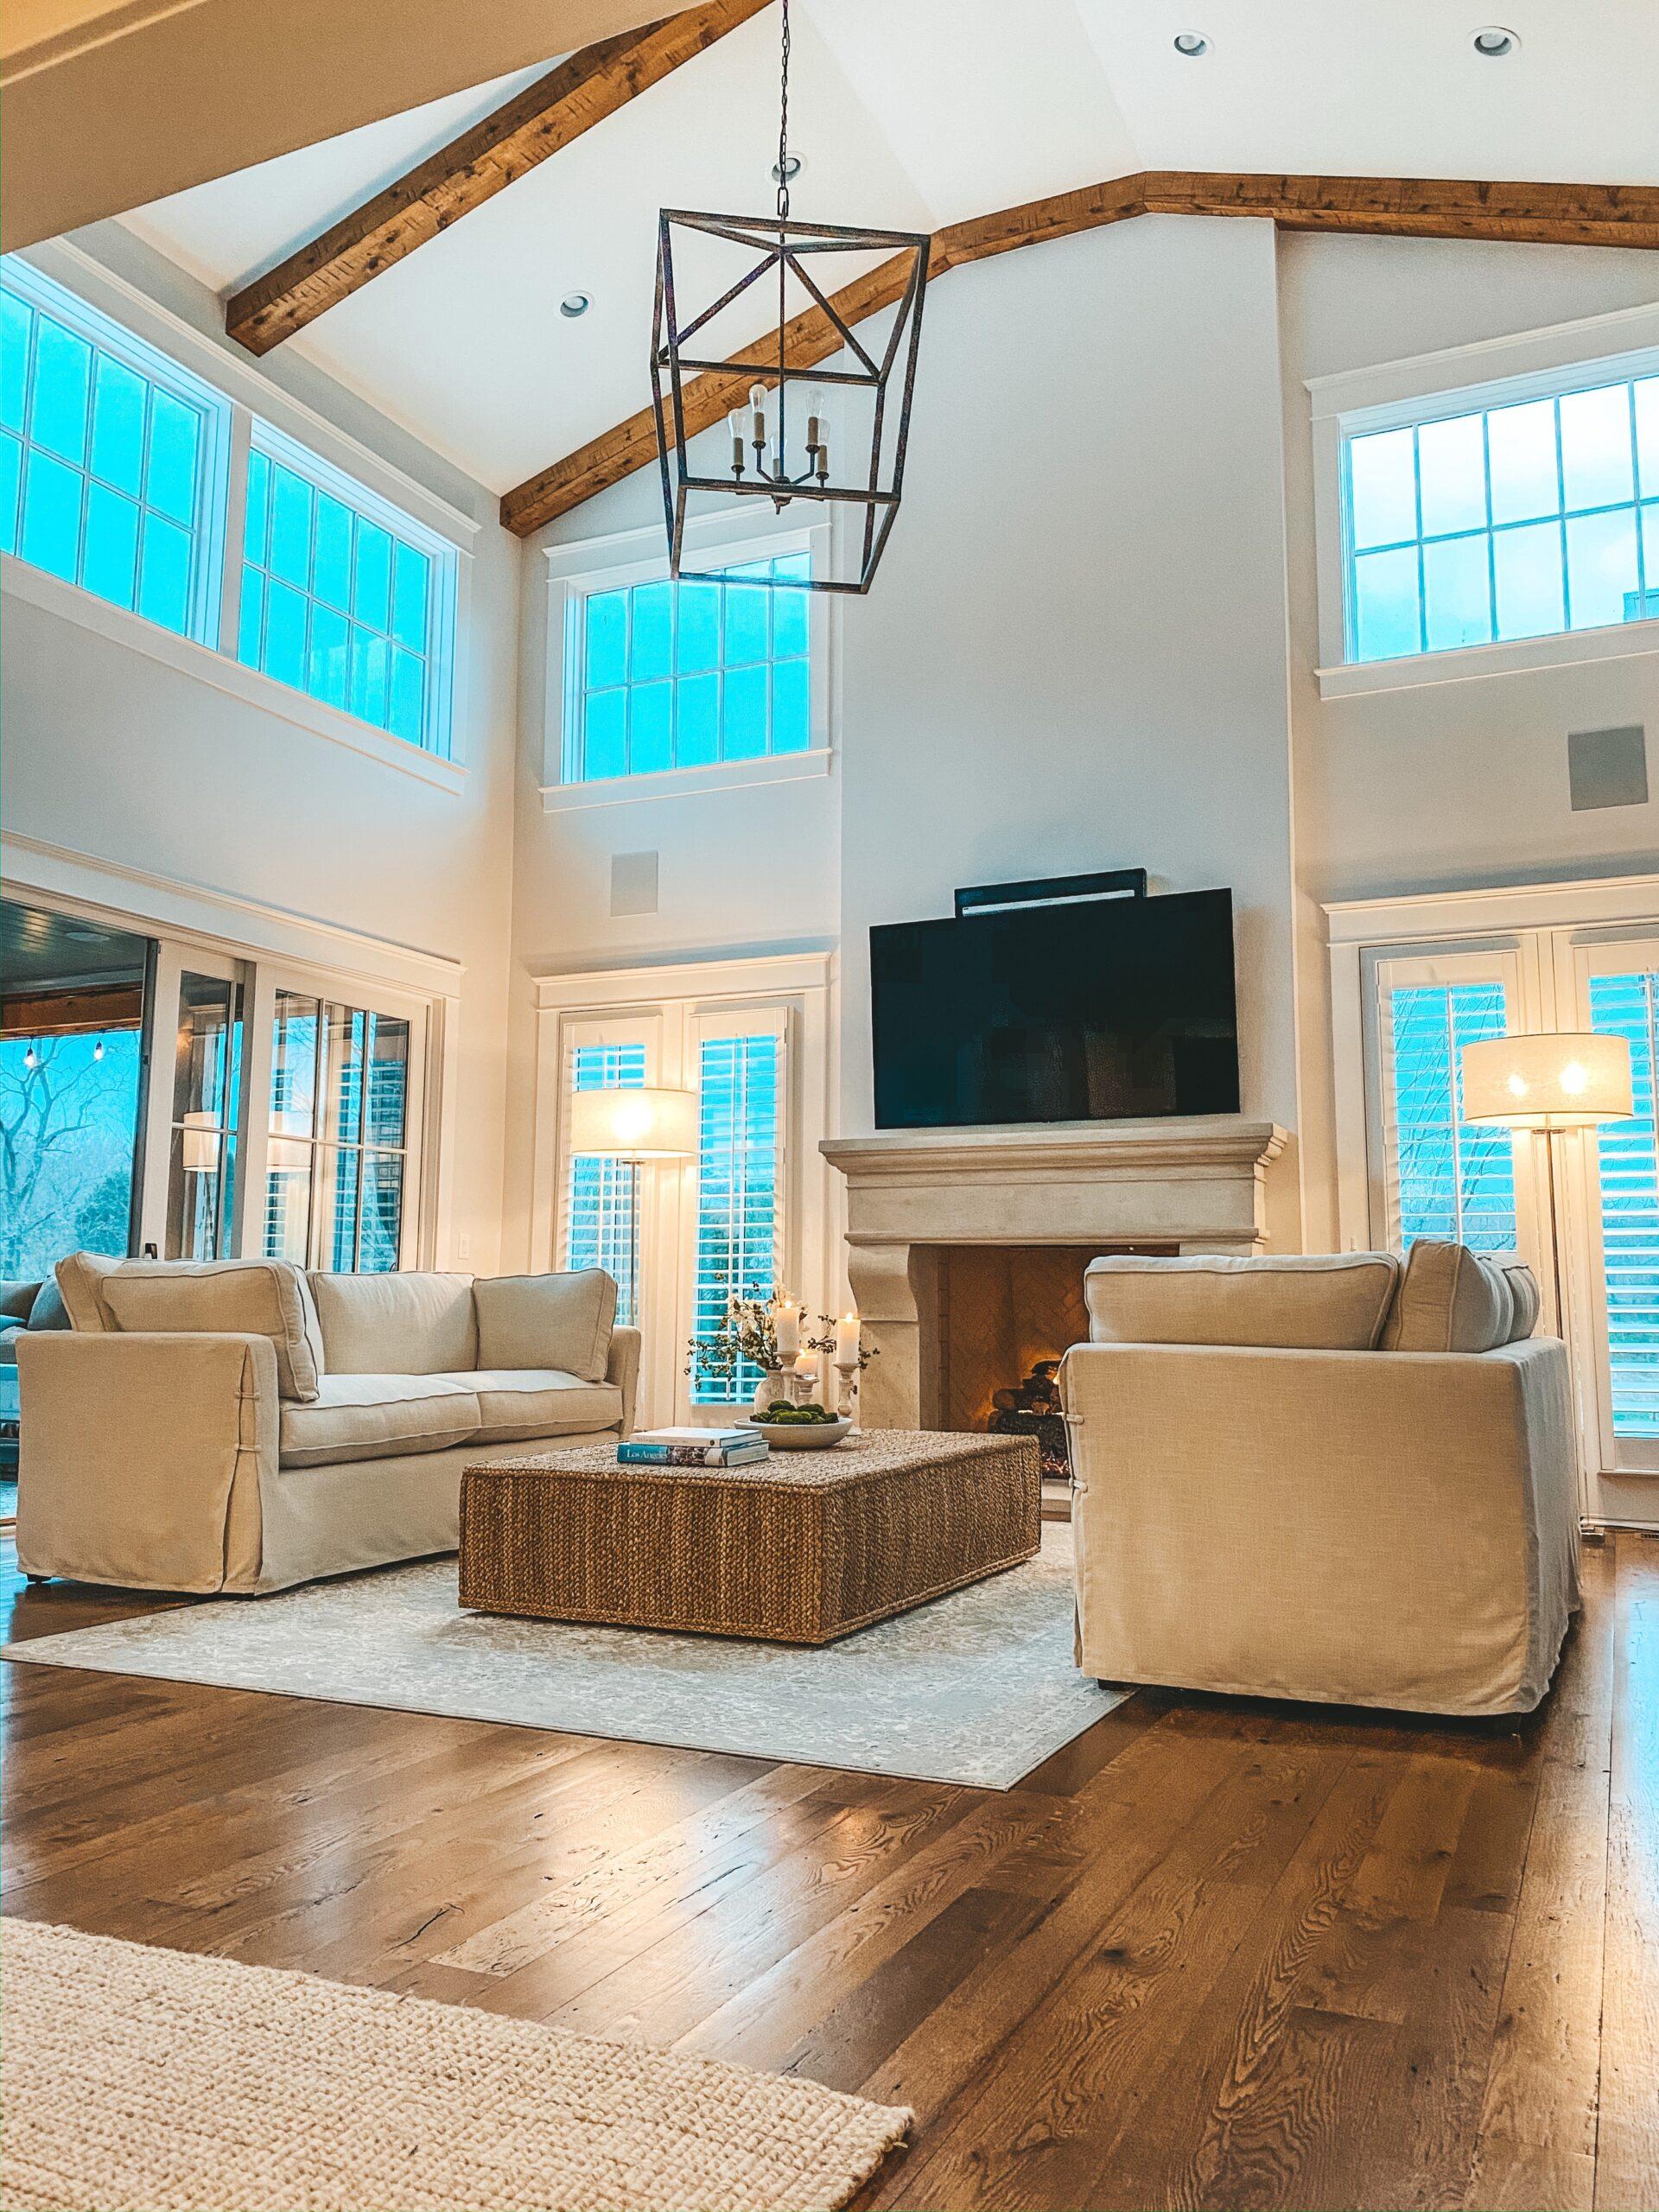 GTT: How To Make Your Home Feel Cozier